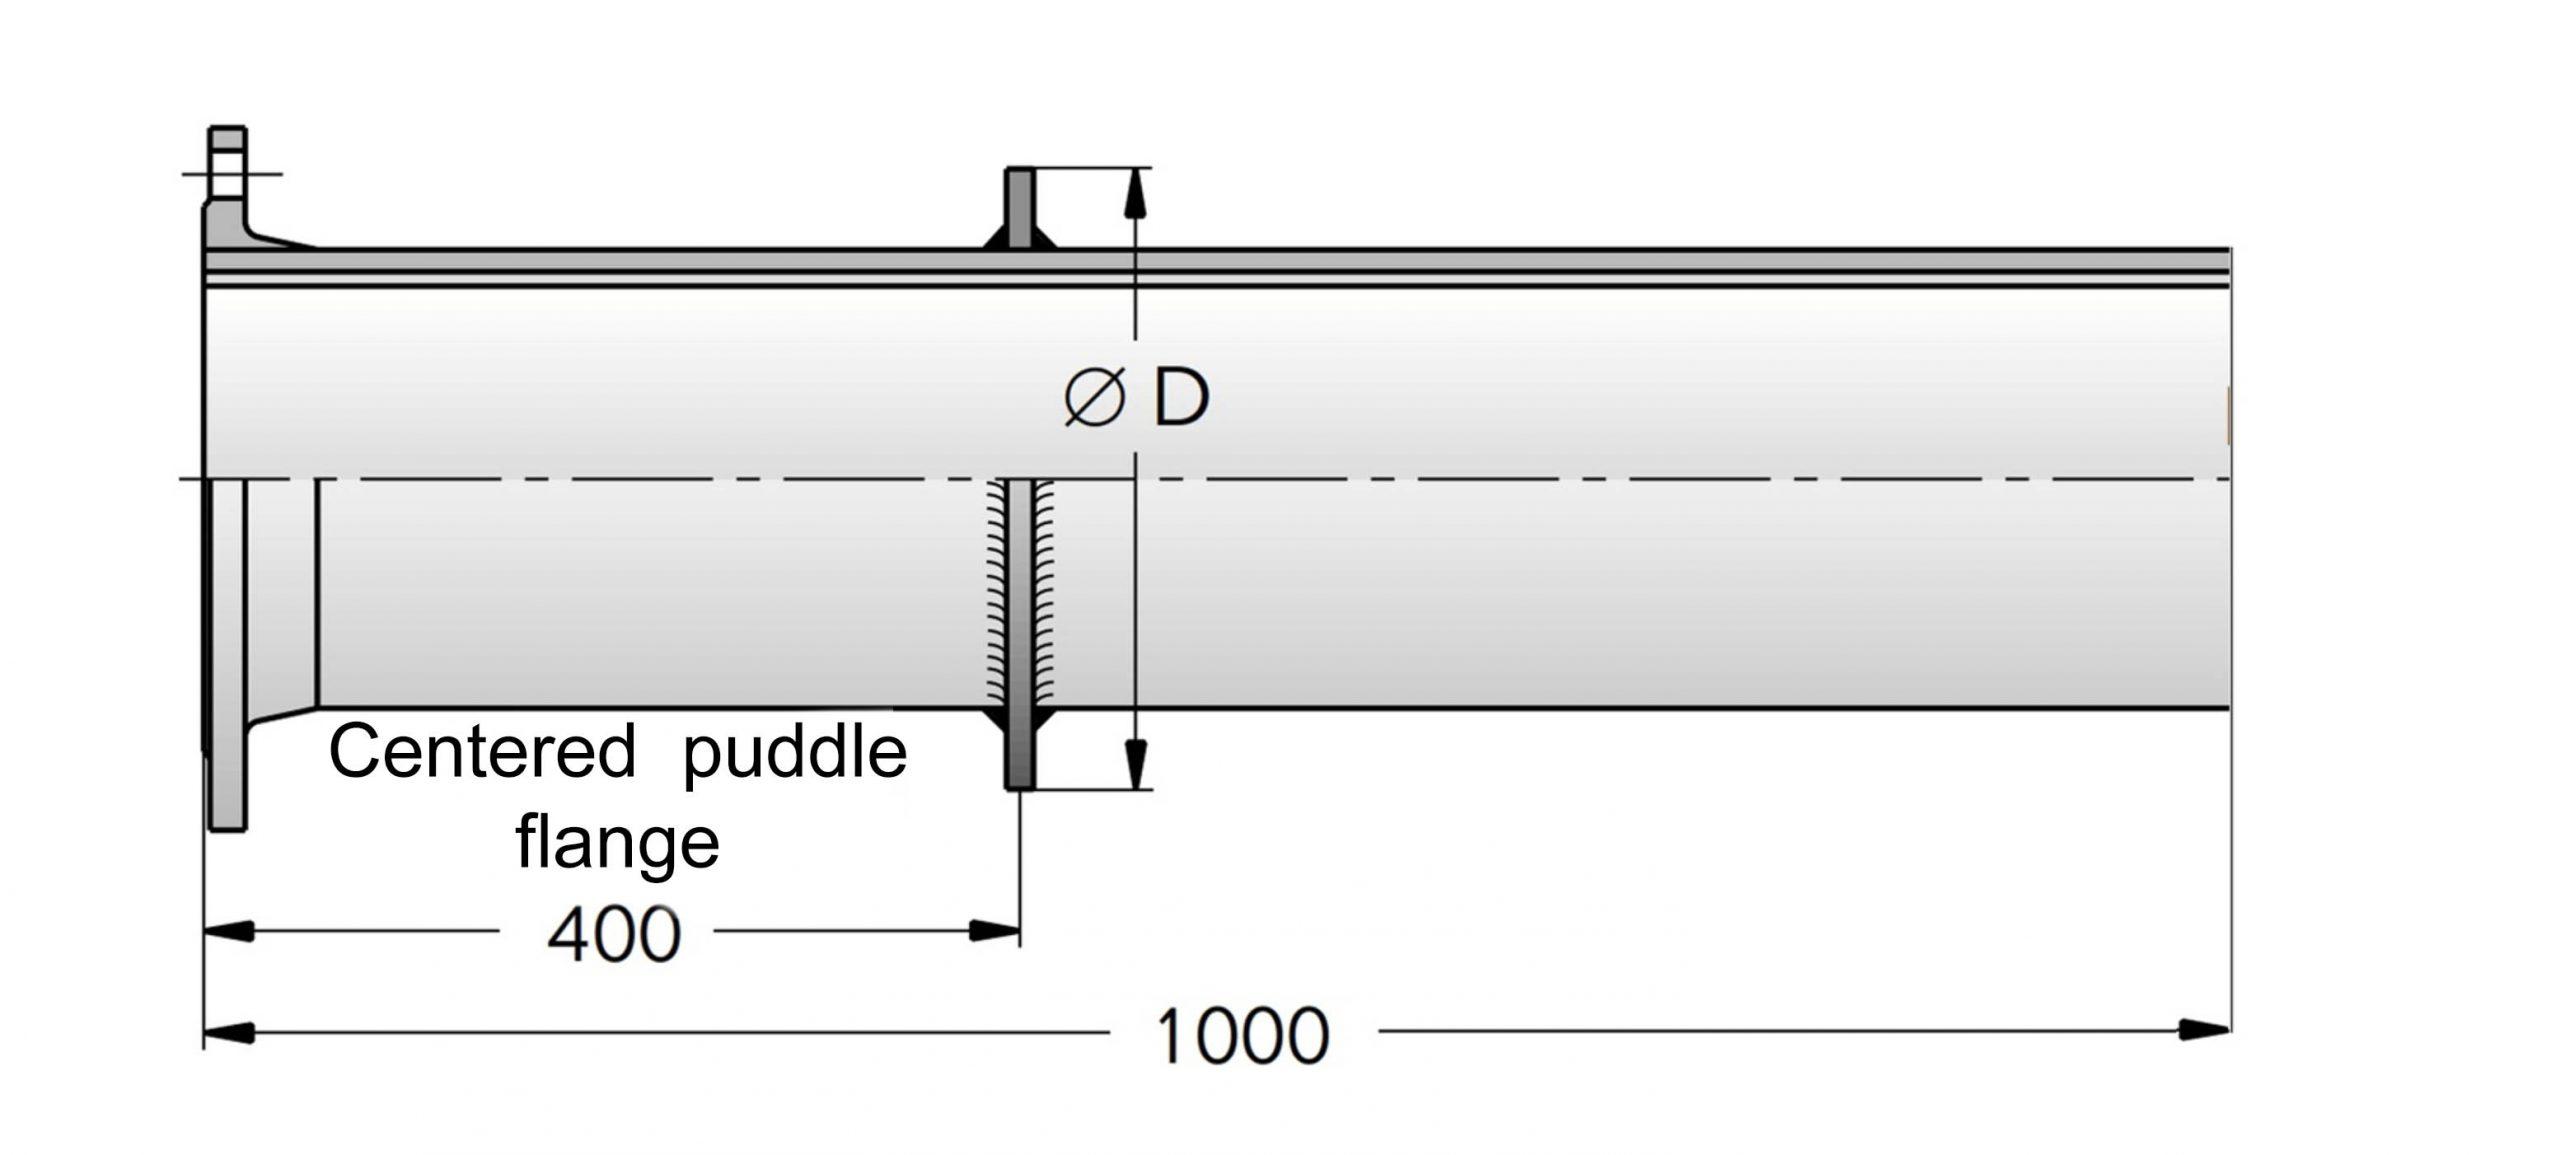 Centered Puddle Flanges